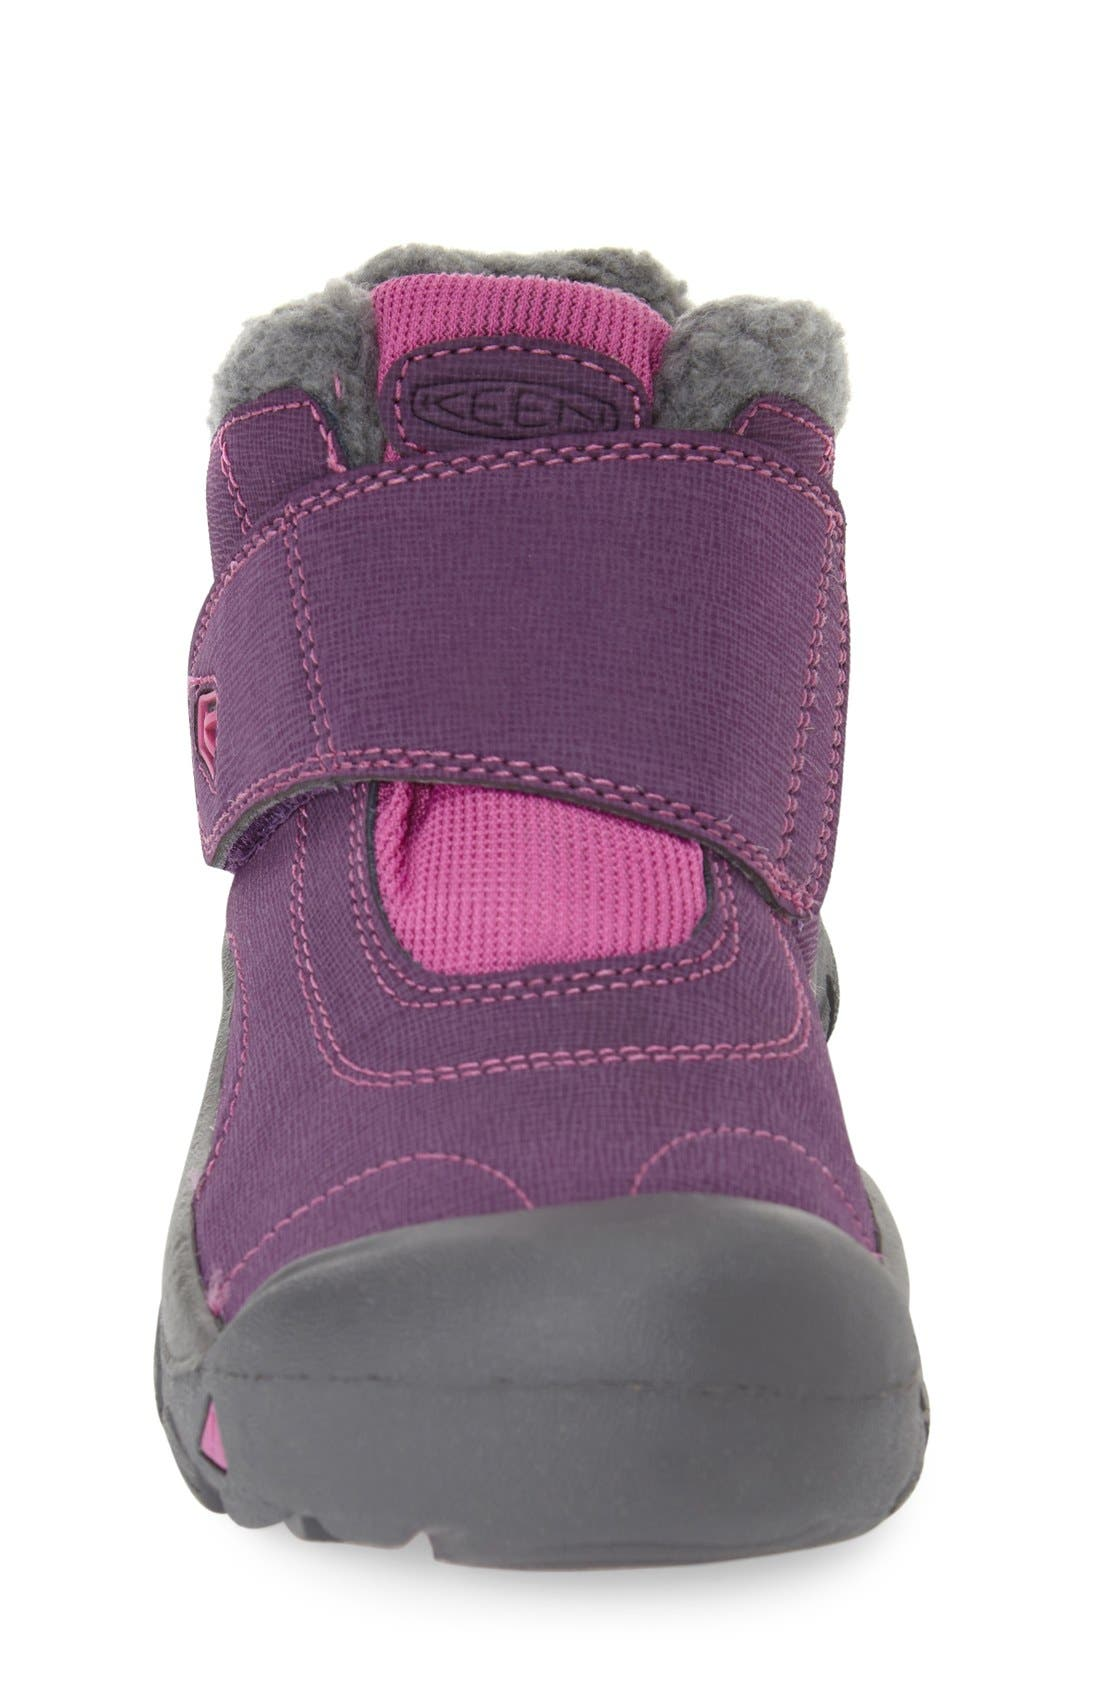 'Kootenay' Waterproof Winter Boot,                             Alternate thumbnail 3, color,                             Wineberry/ Dahlia Mauve